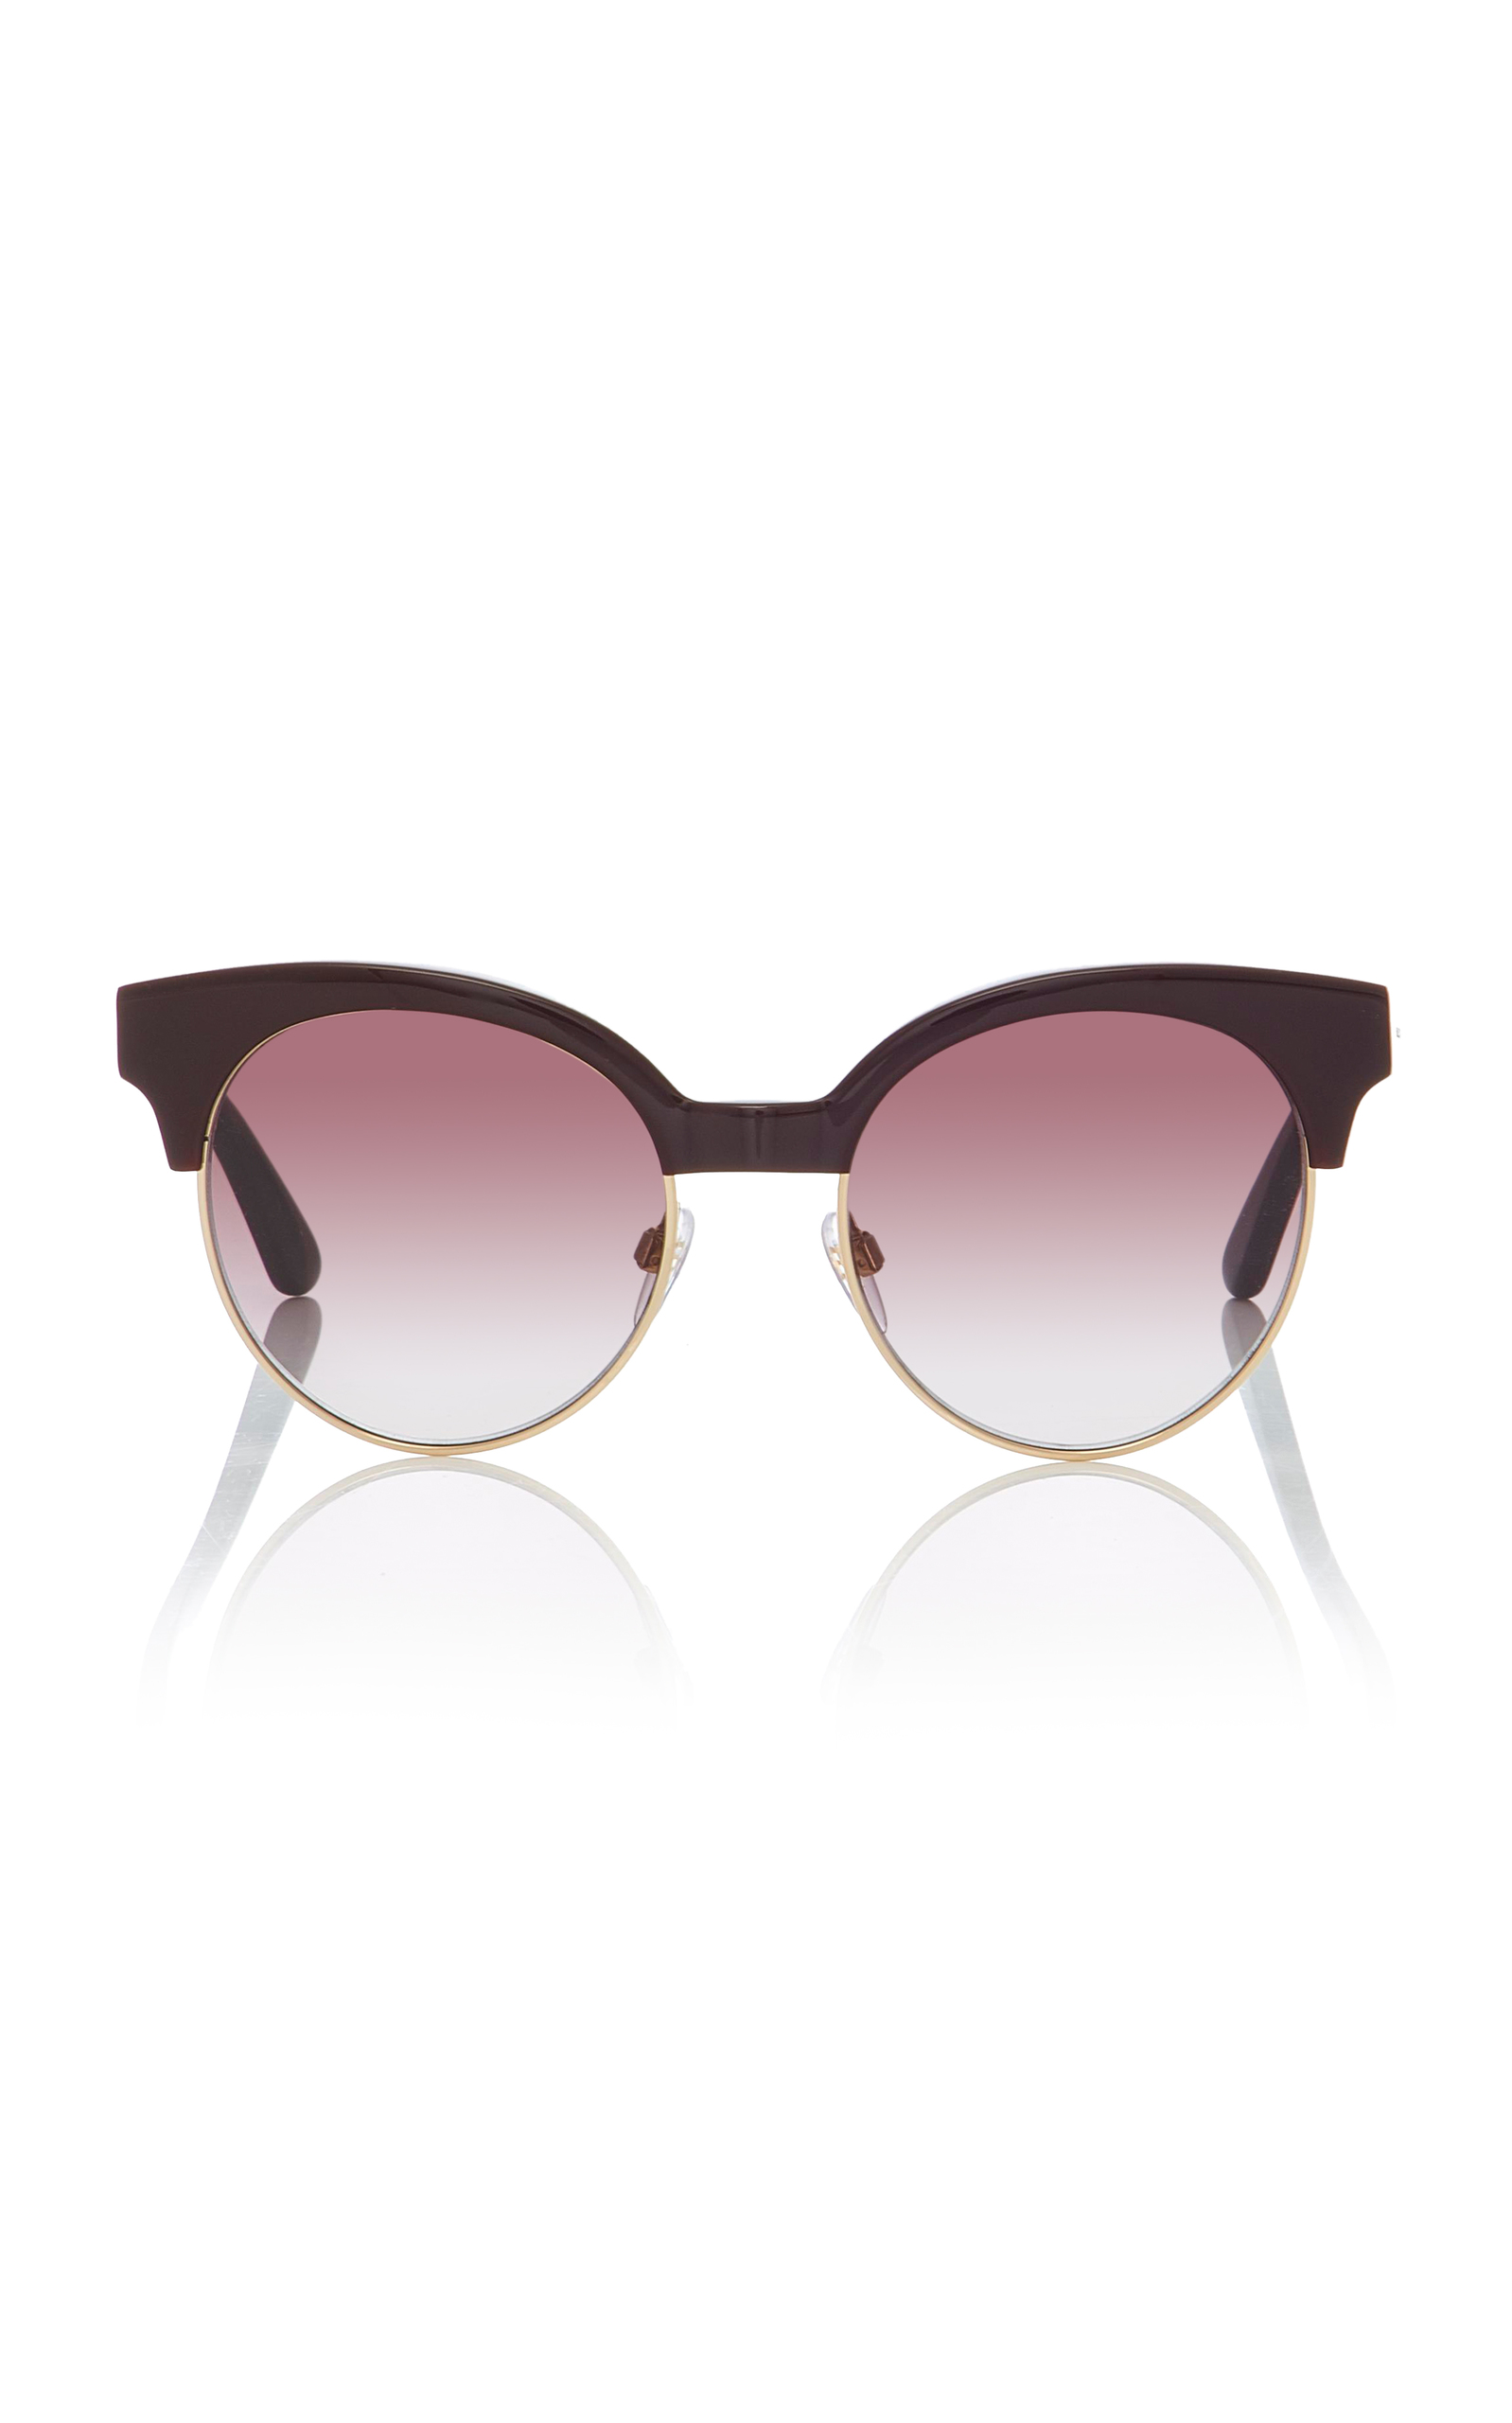 Circle-Frame Sunglasses by Balenciaga Sunglasses   Moda Operandi